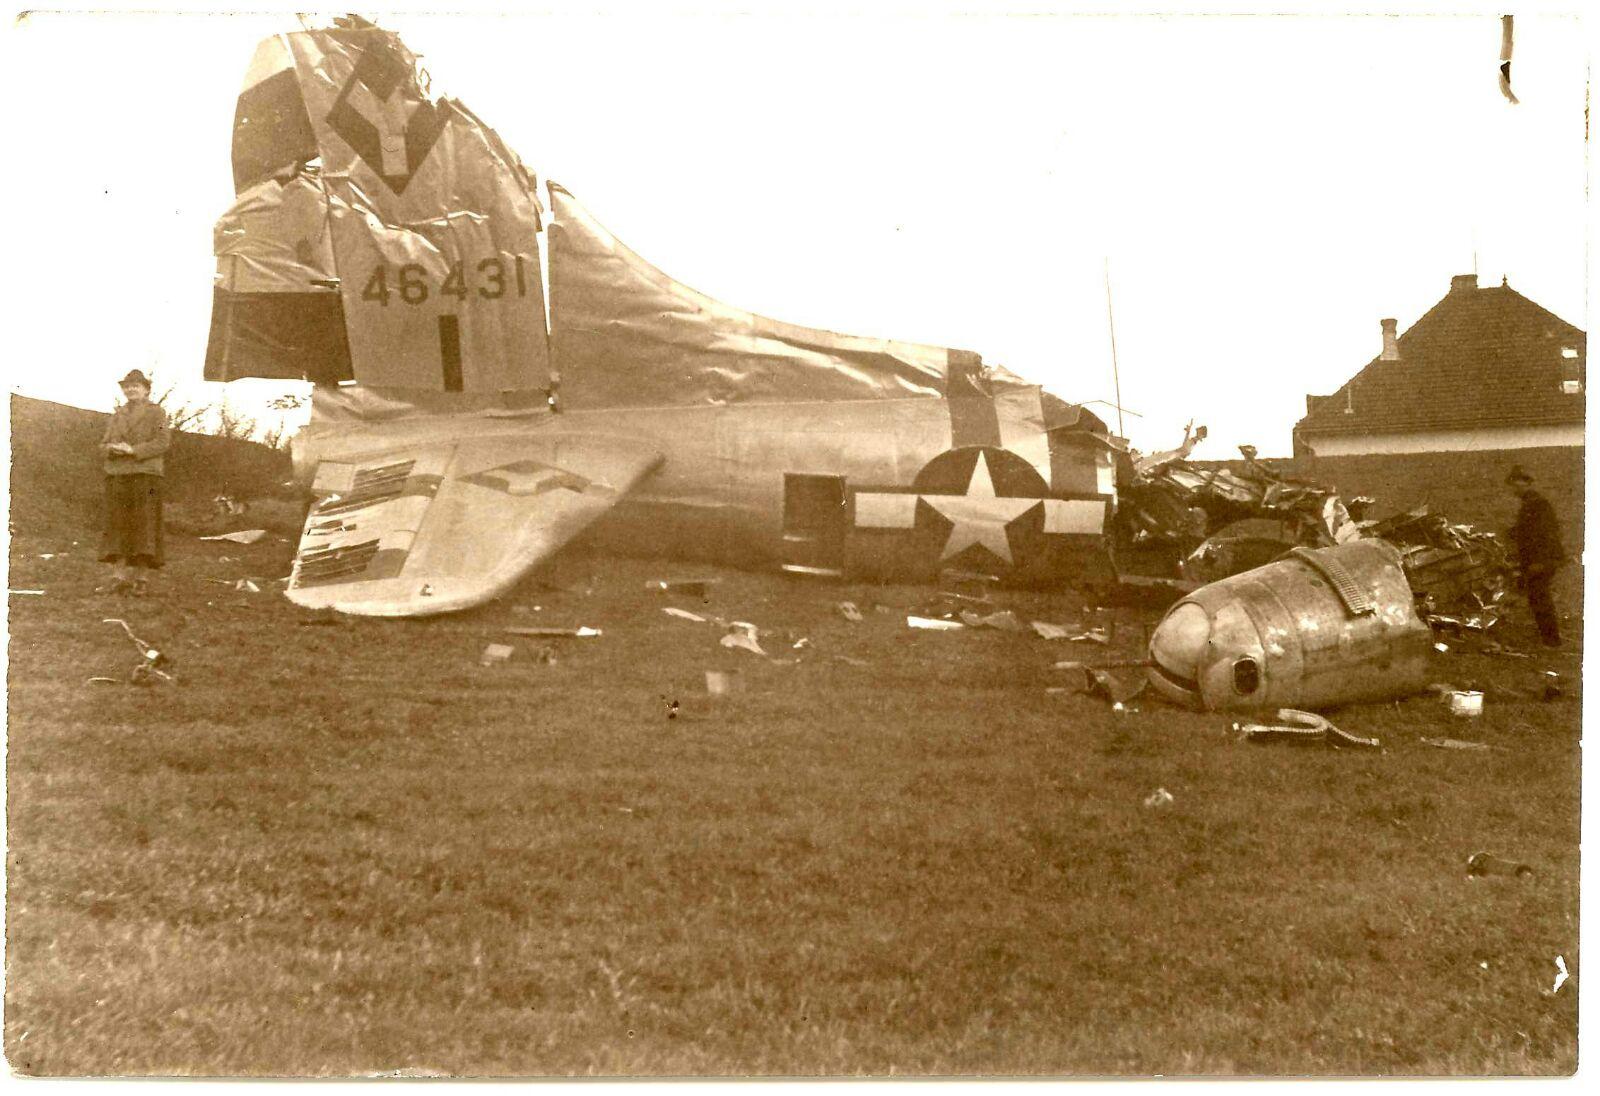 B-17 #44-6431 / Old Folks